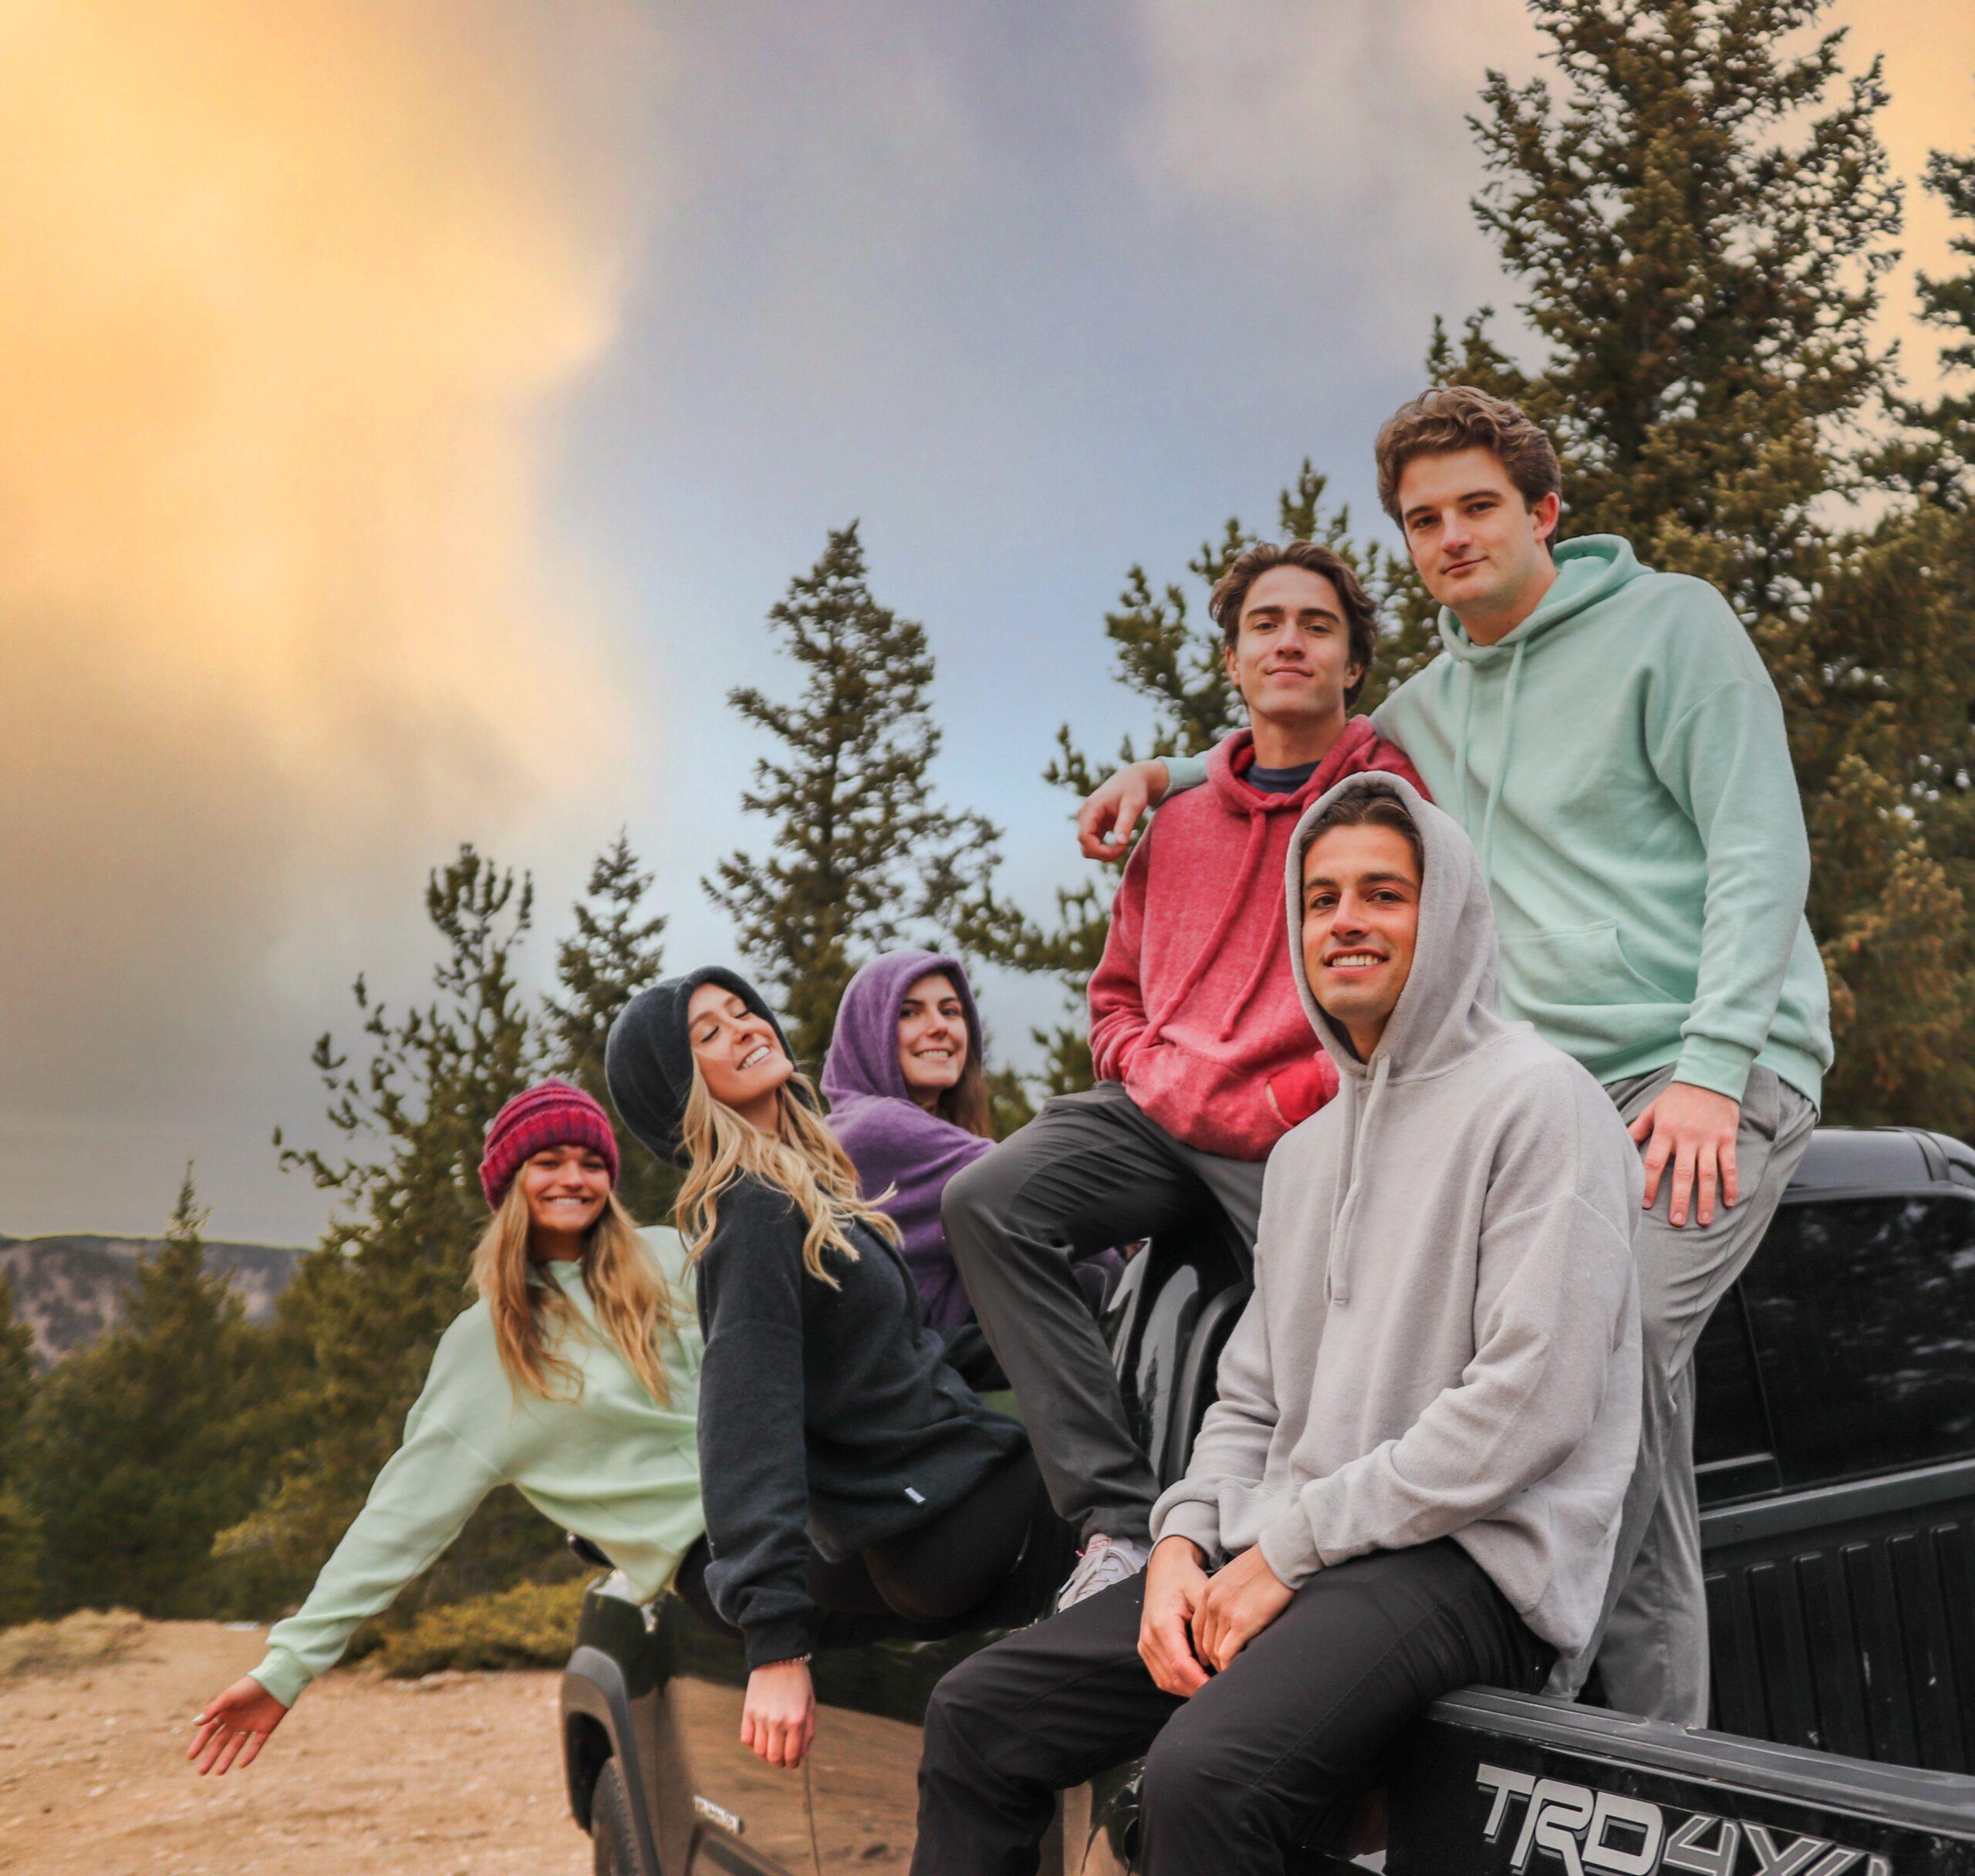 hoodies and sweatshirt